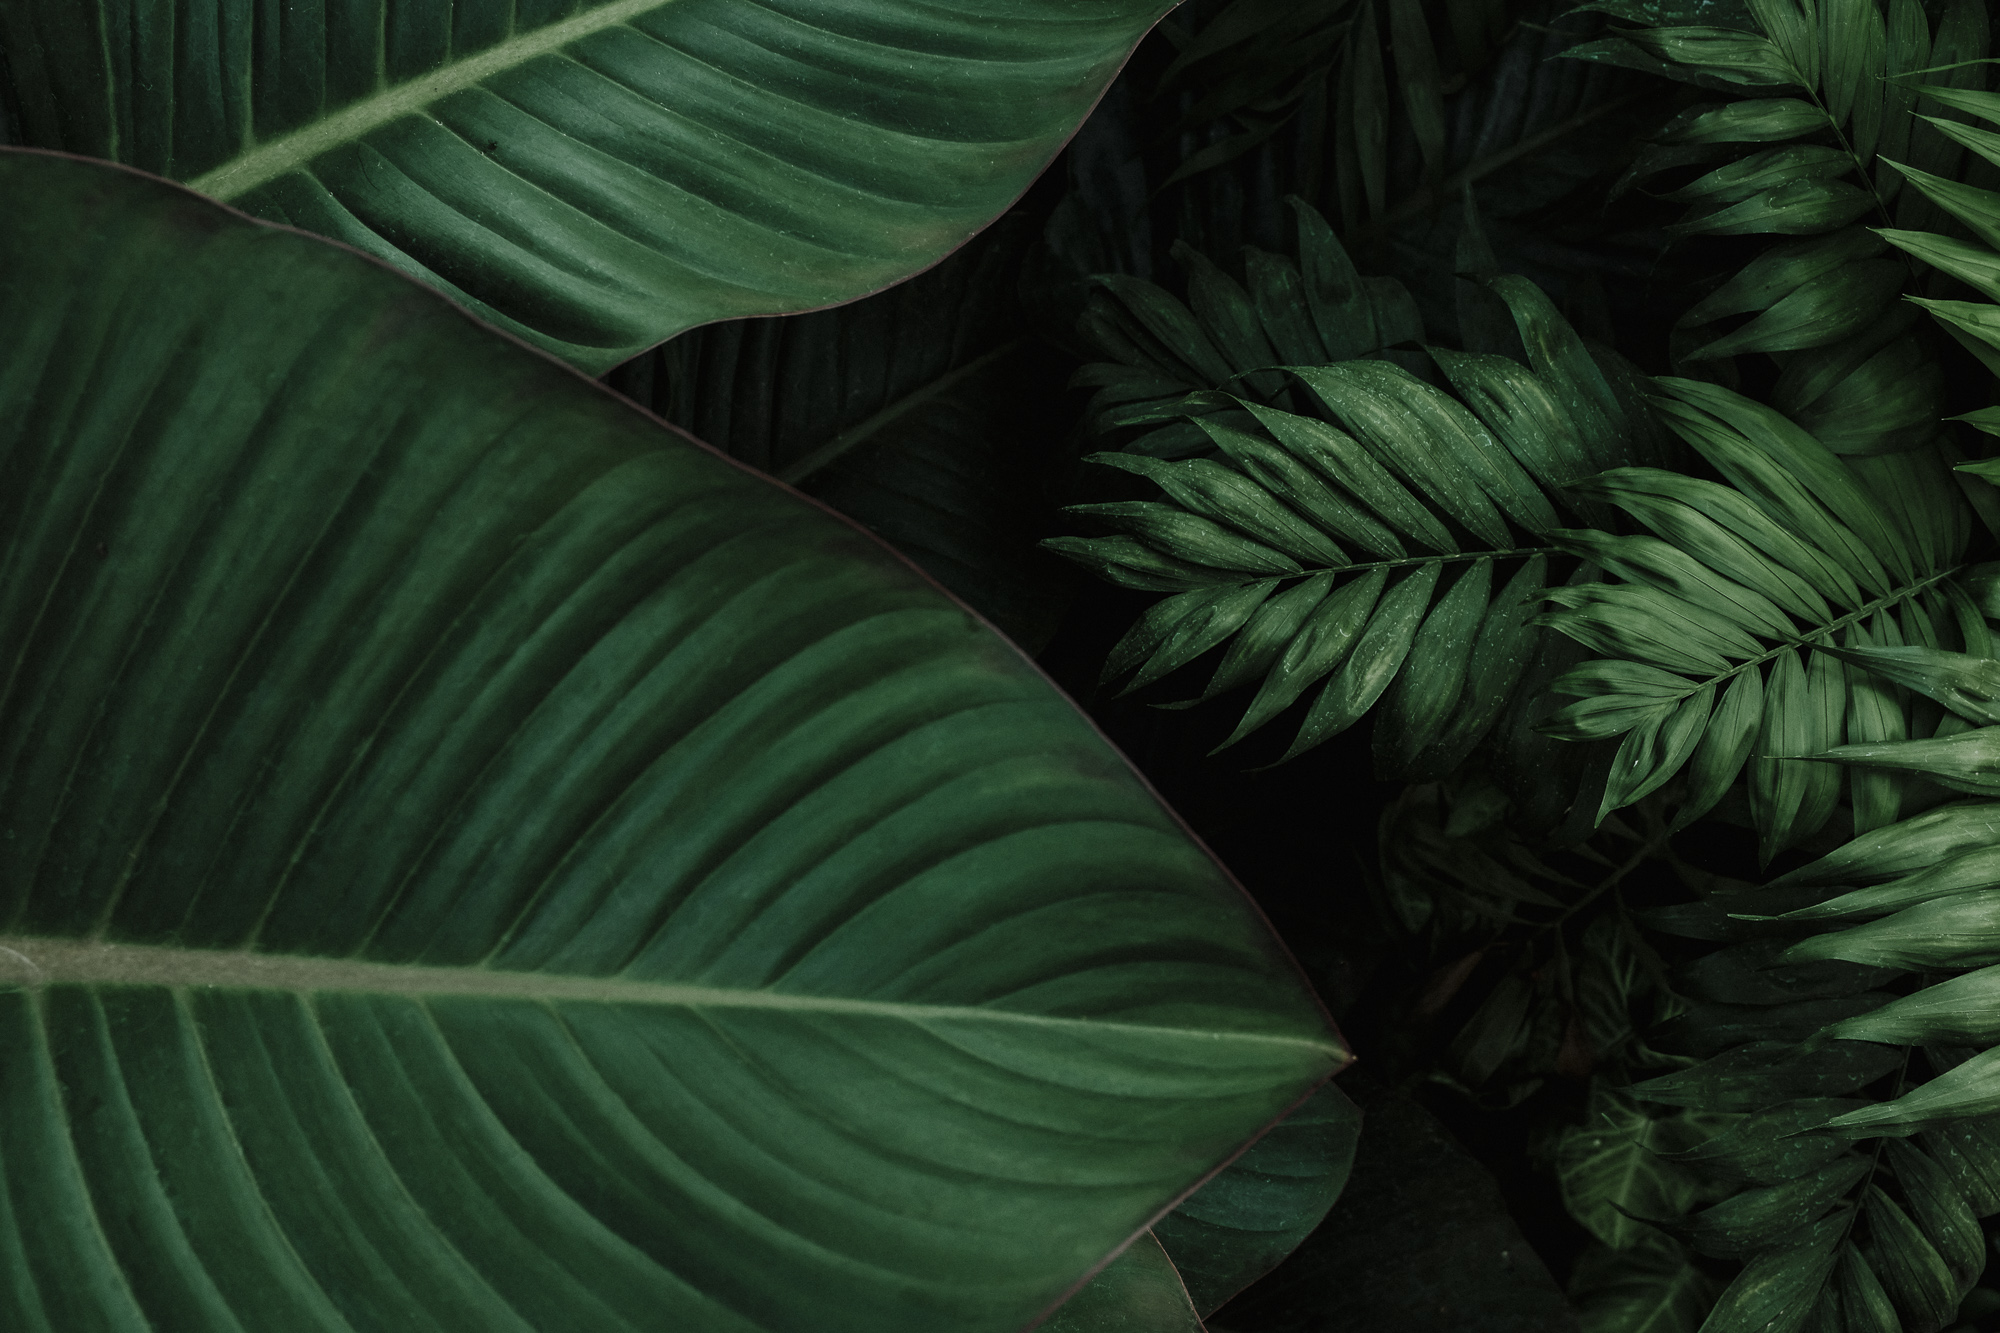 karmen-meyer-photography-tropical-foliage-fine-art-print-9710.jpg